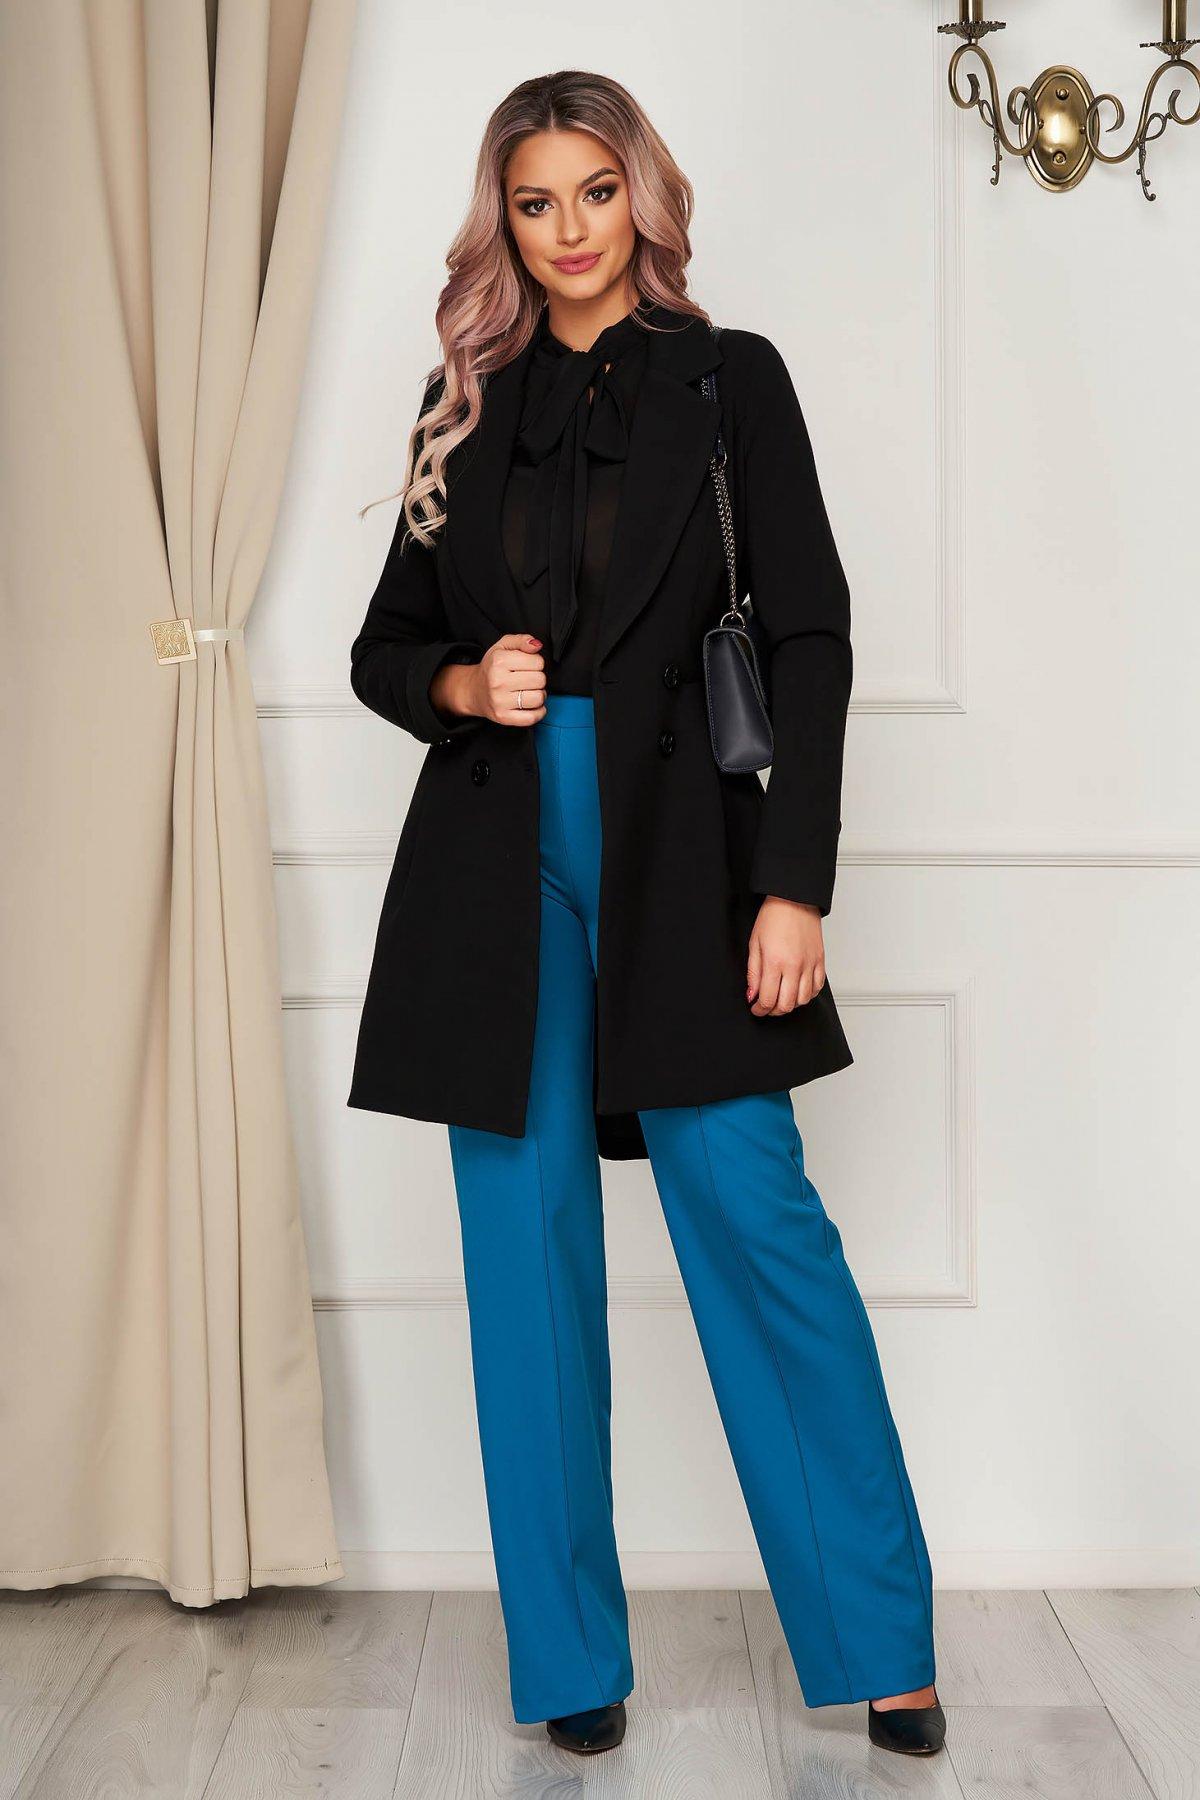 Palton Artista Negru Cambrat Captusit Pe Interior Din Stofa Usor Elastica